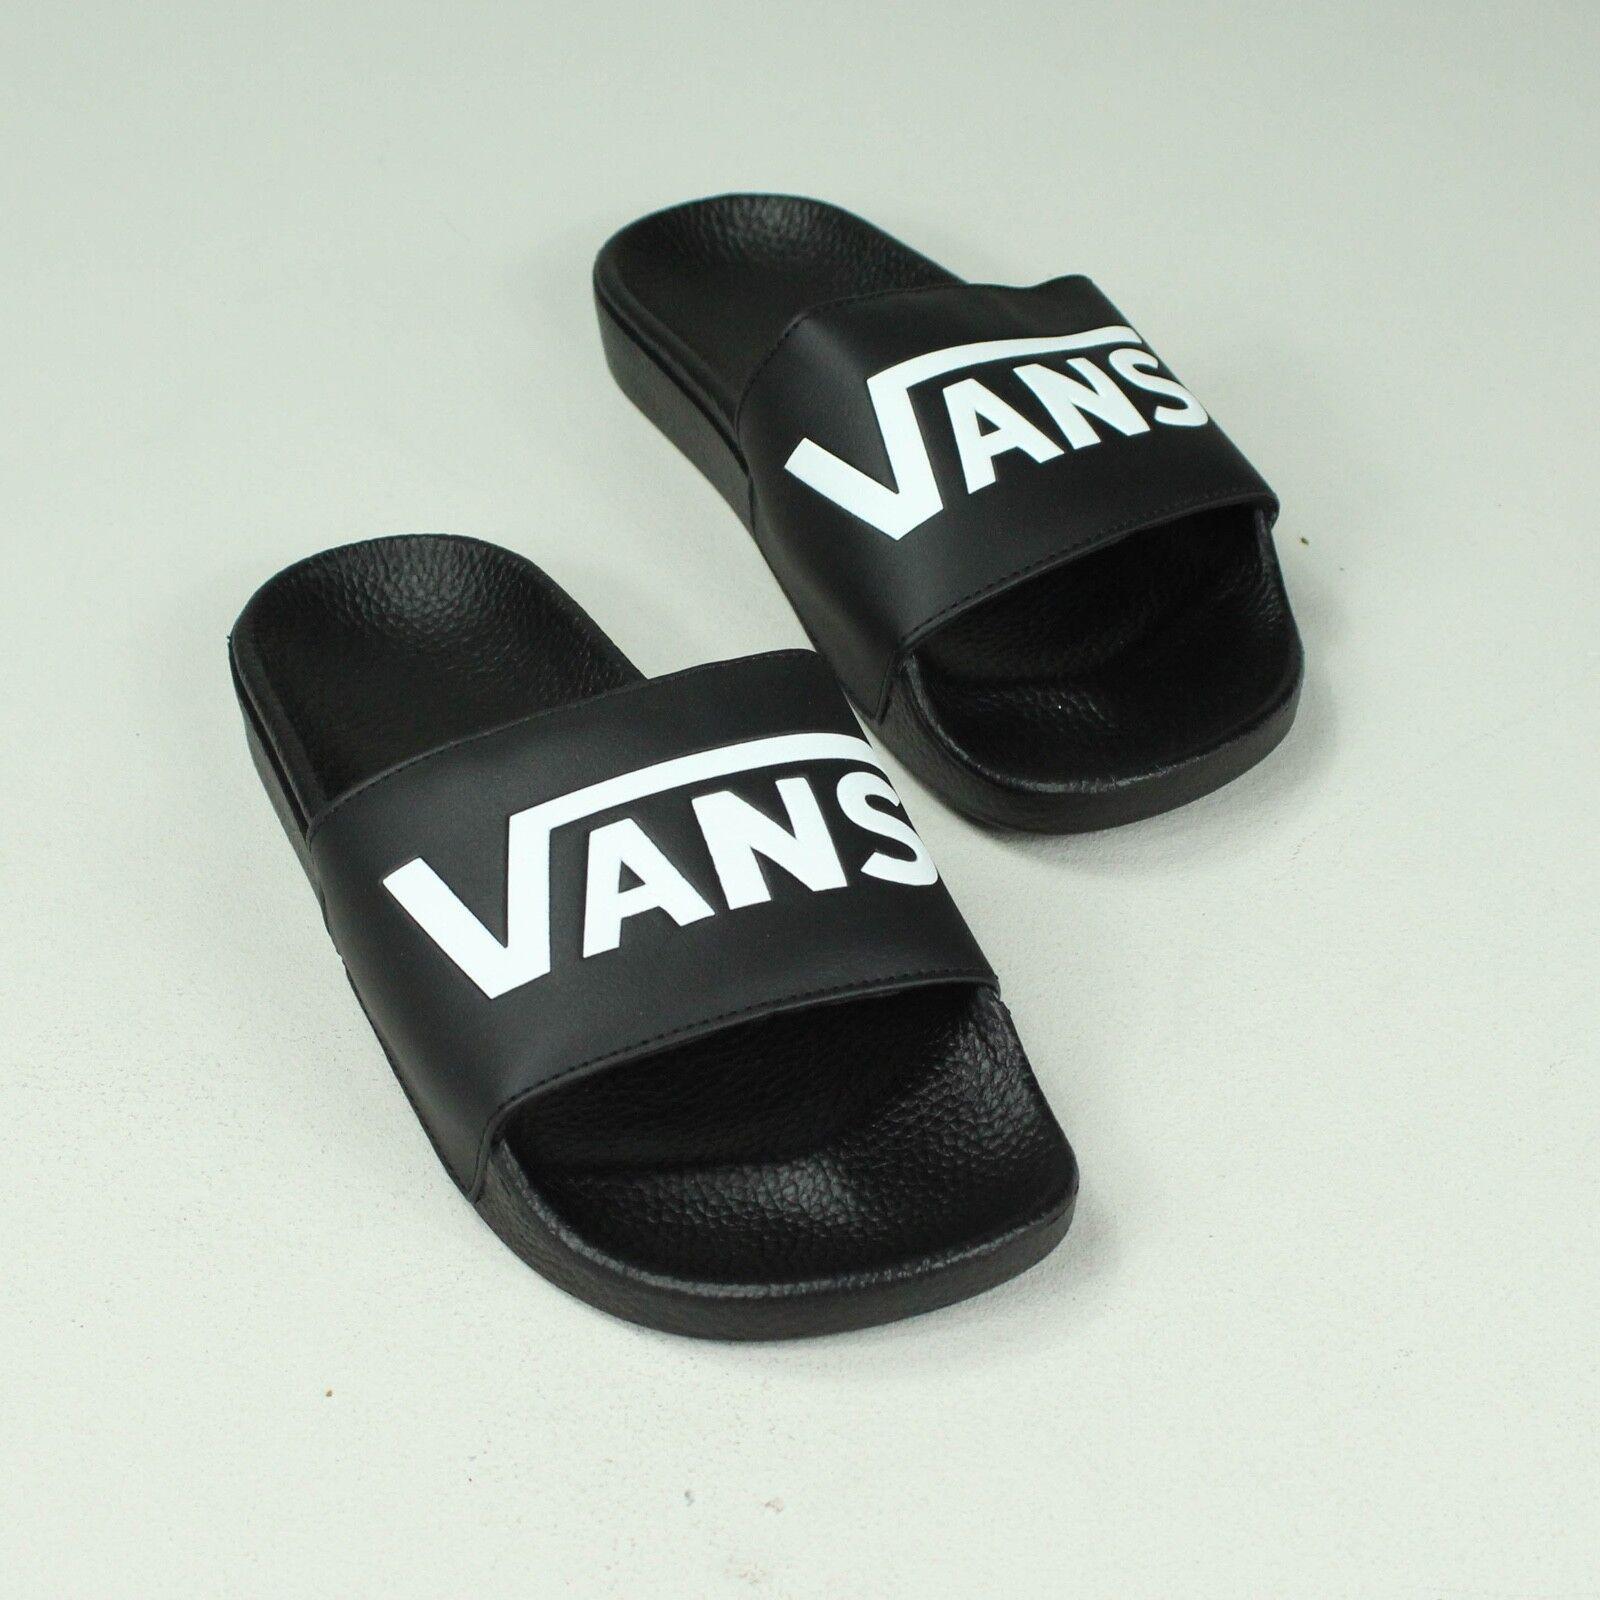 Vans Classic Slide On Sandals Sliders